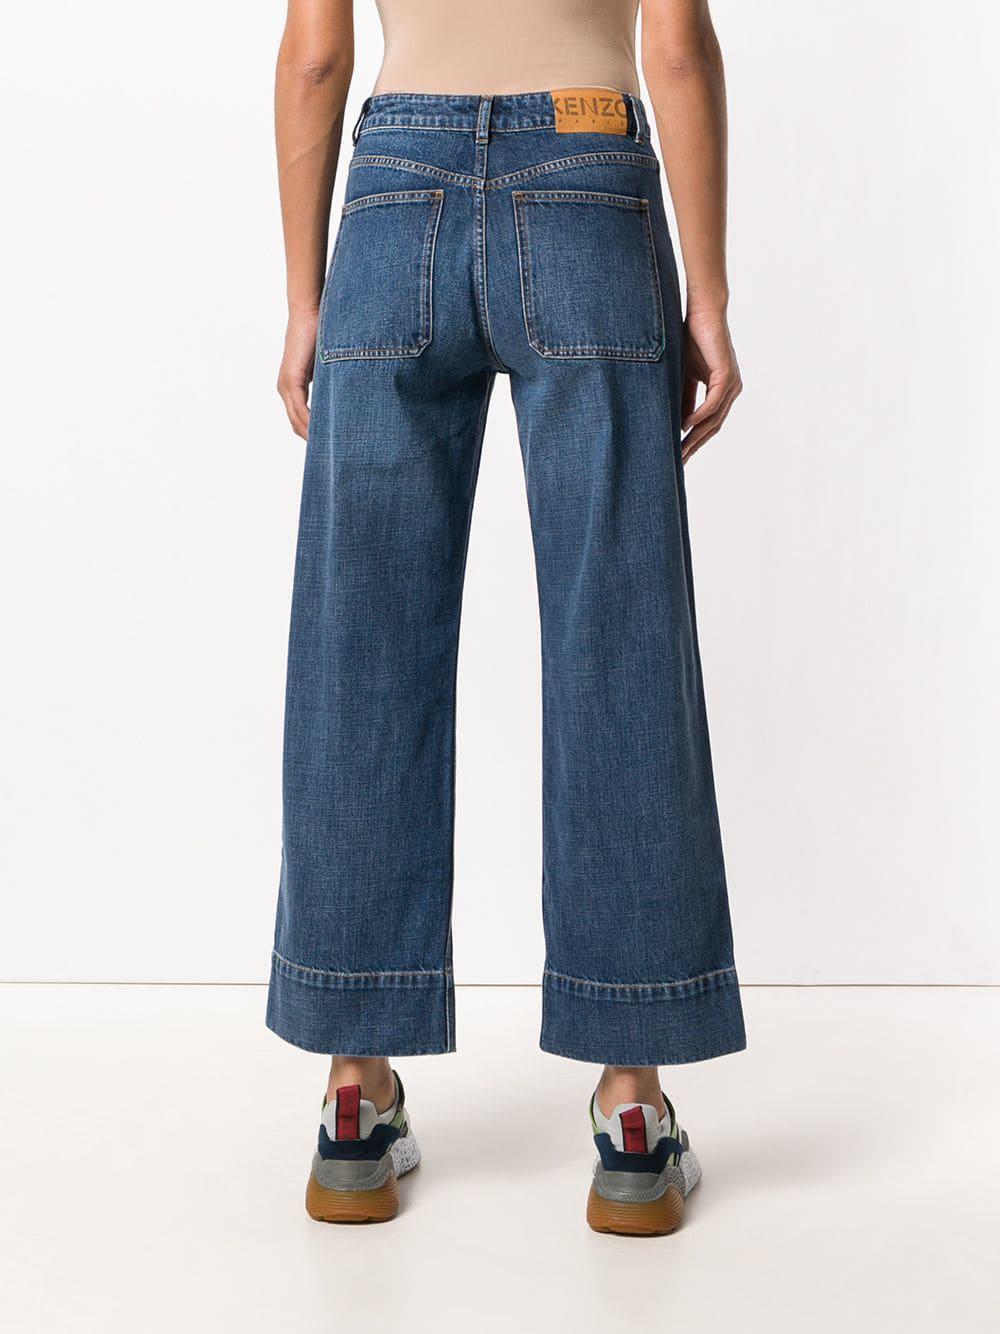 ab78c791 KENZO Wide Leg Jeans in Blue - Lyst